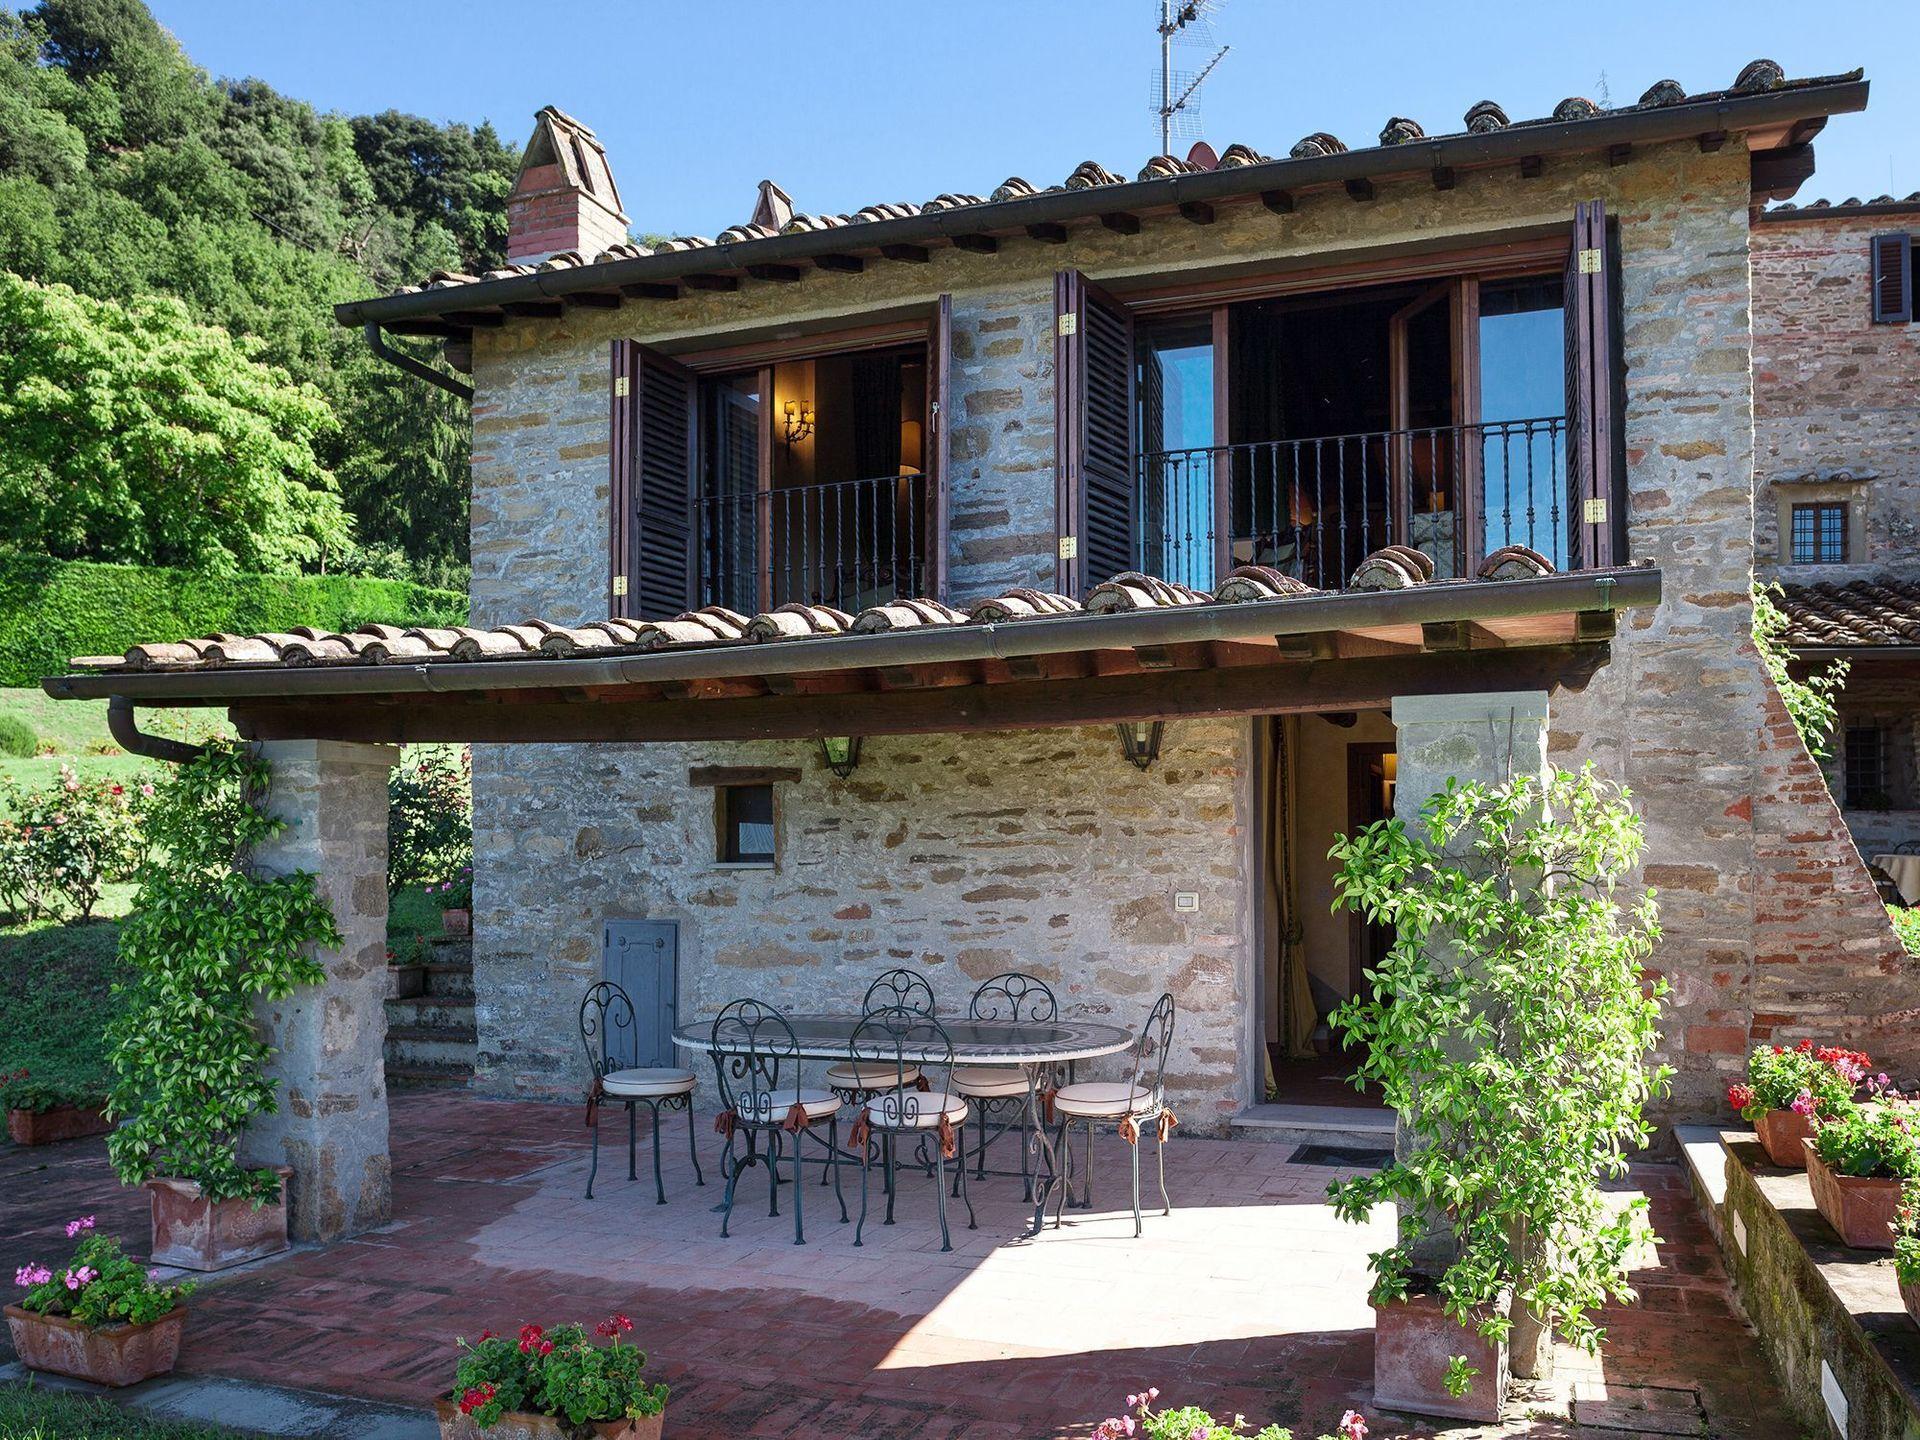 Vicchio villa vacation rental la terrazza dei frati that sleeps 10 people in 4 bedrooms located - Villa la terrazza ...